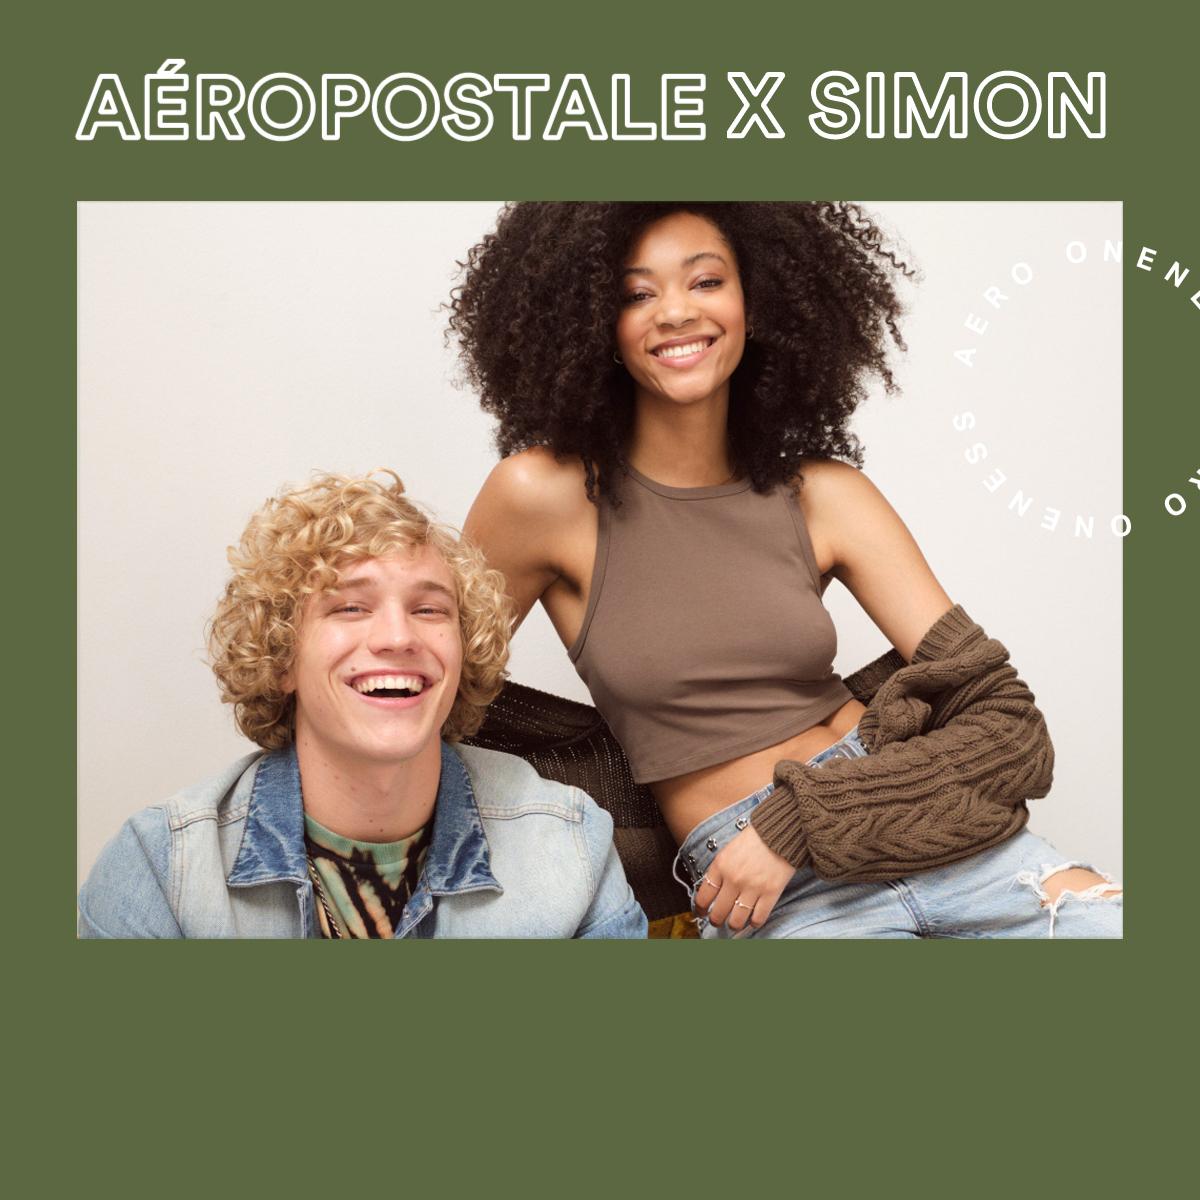 aero x simon sweeps - promo spot - all centers - Copy - Copy image